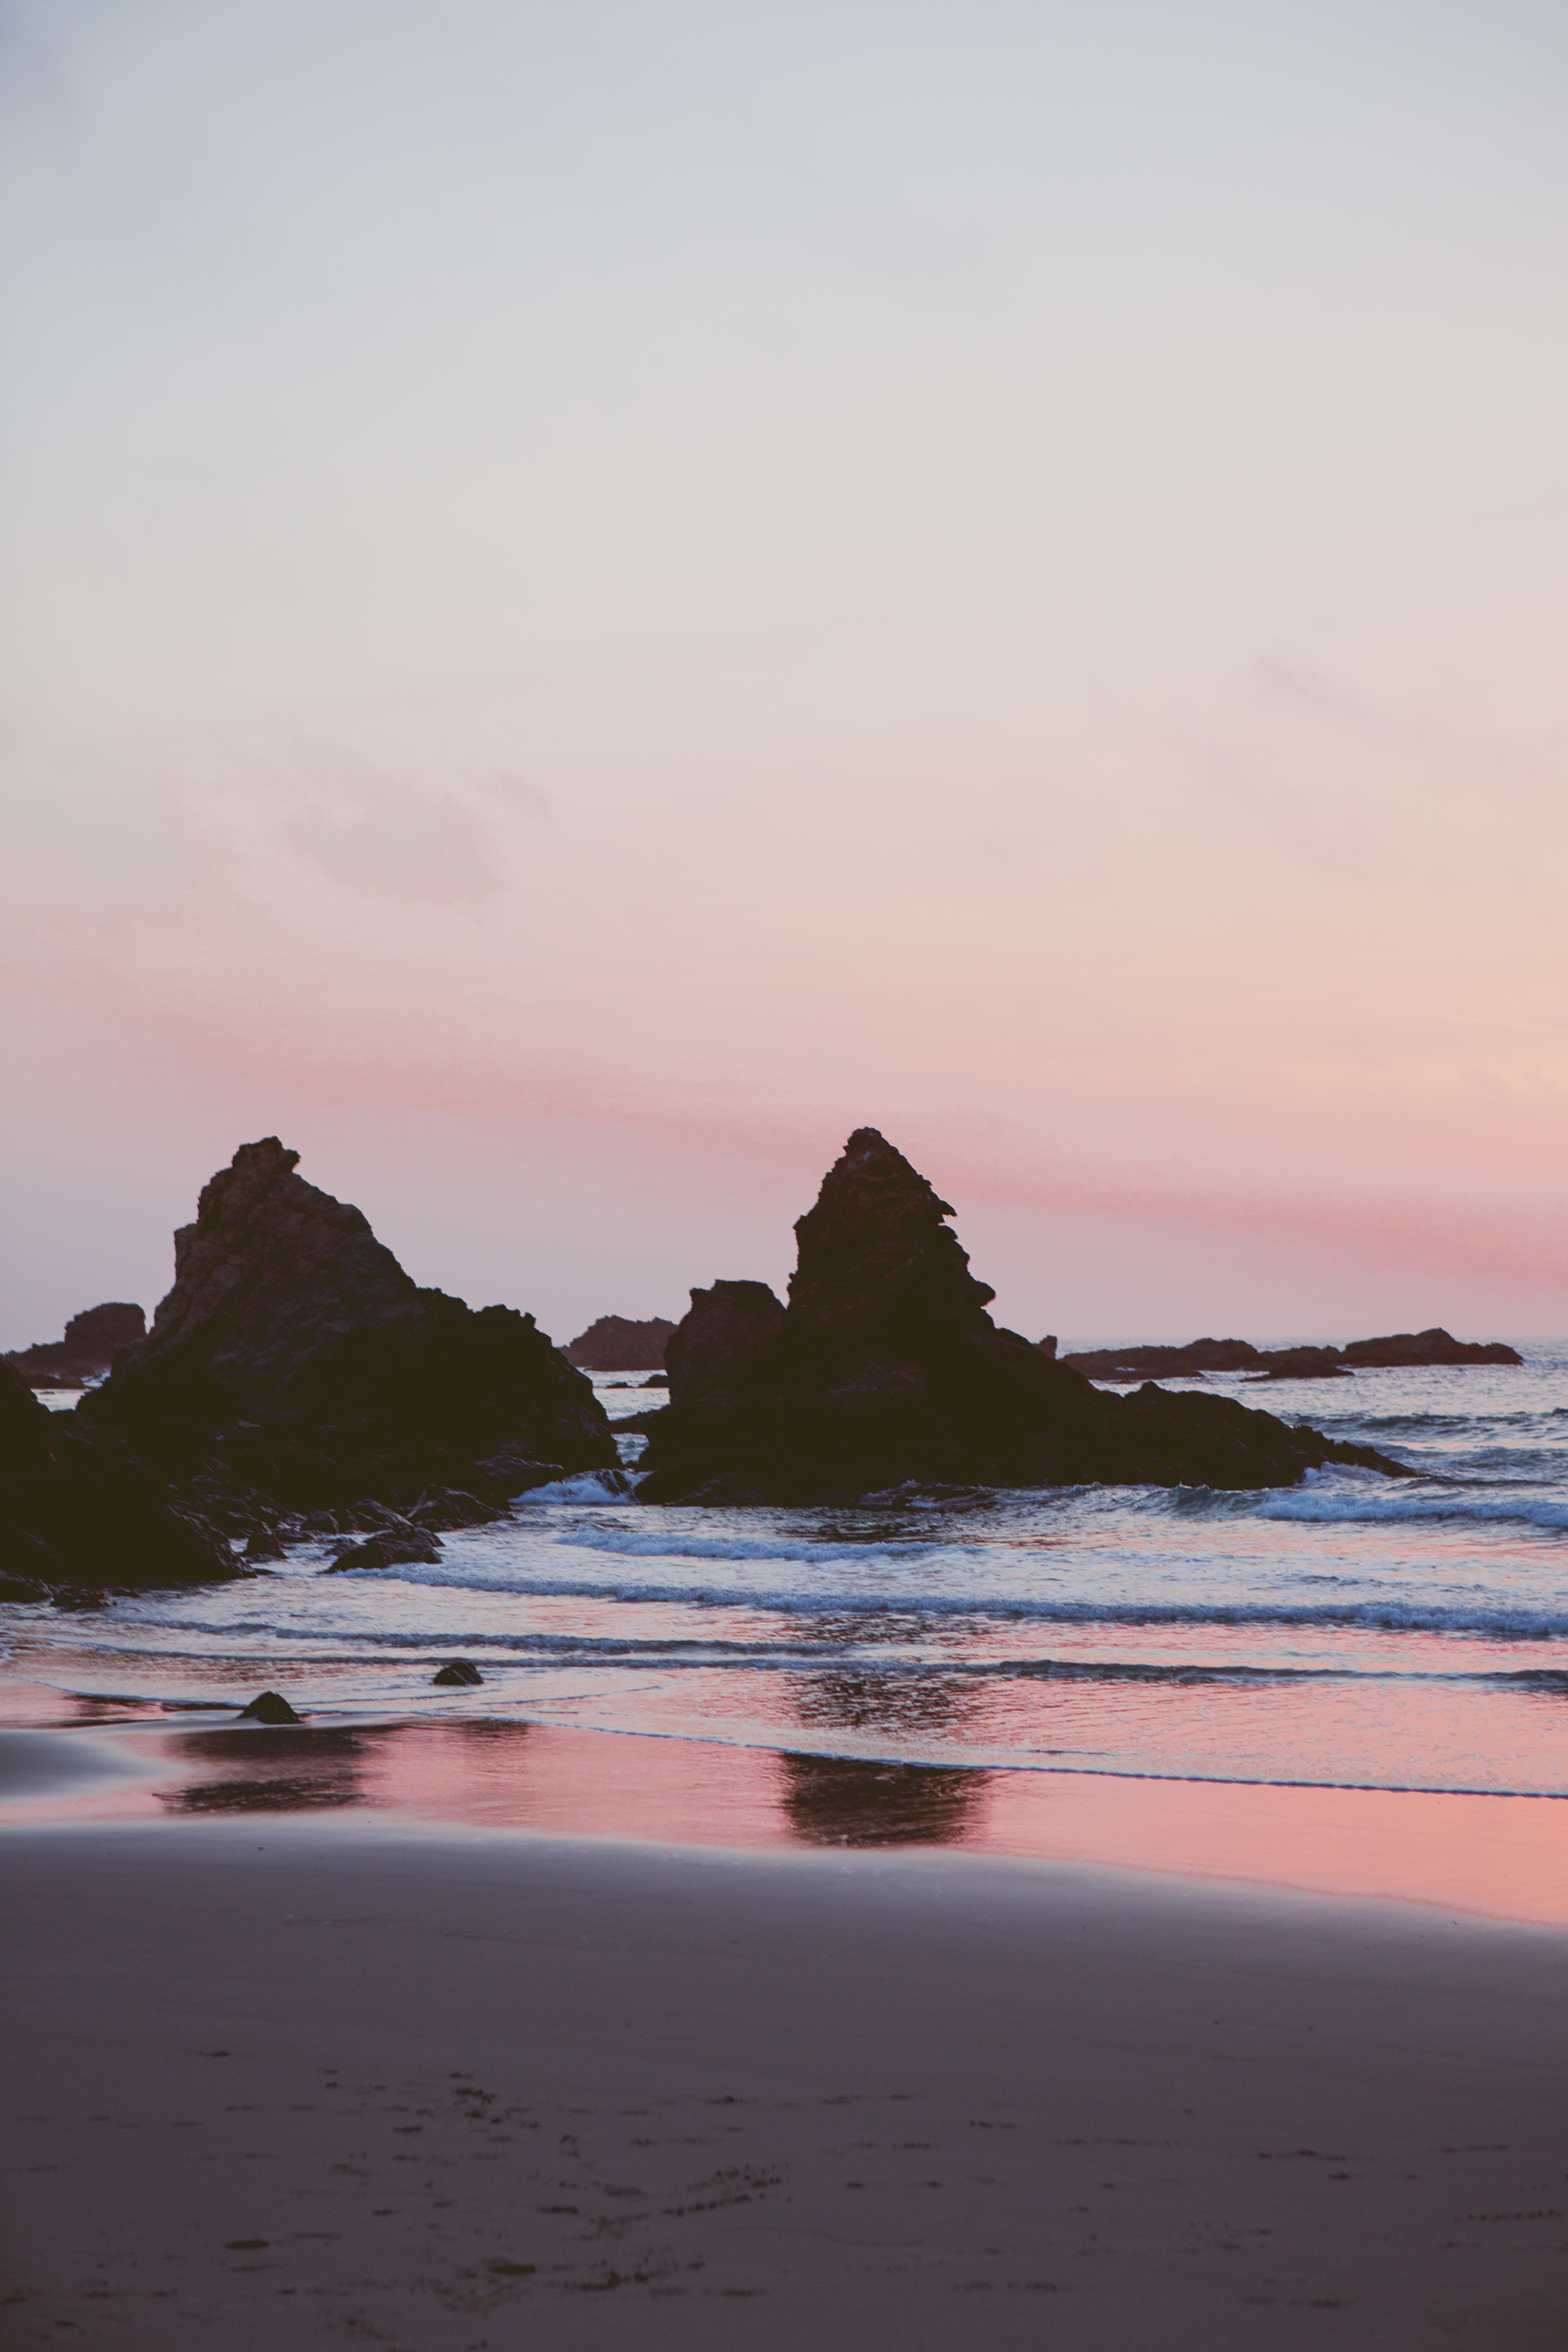 caspar sunset-1.jpg